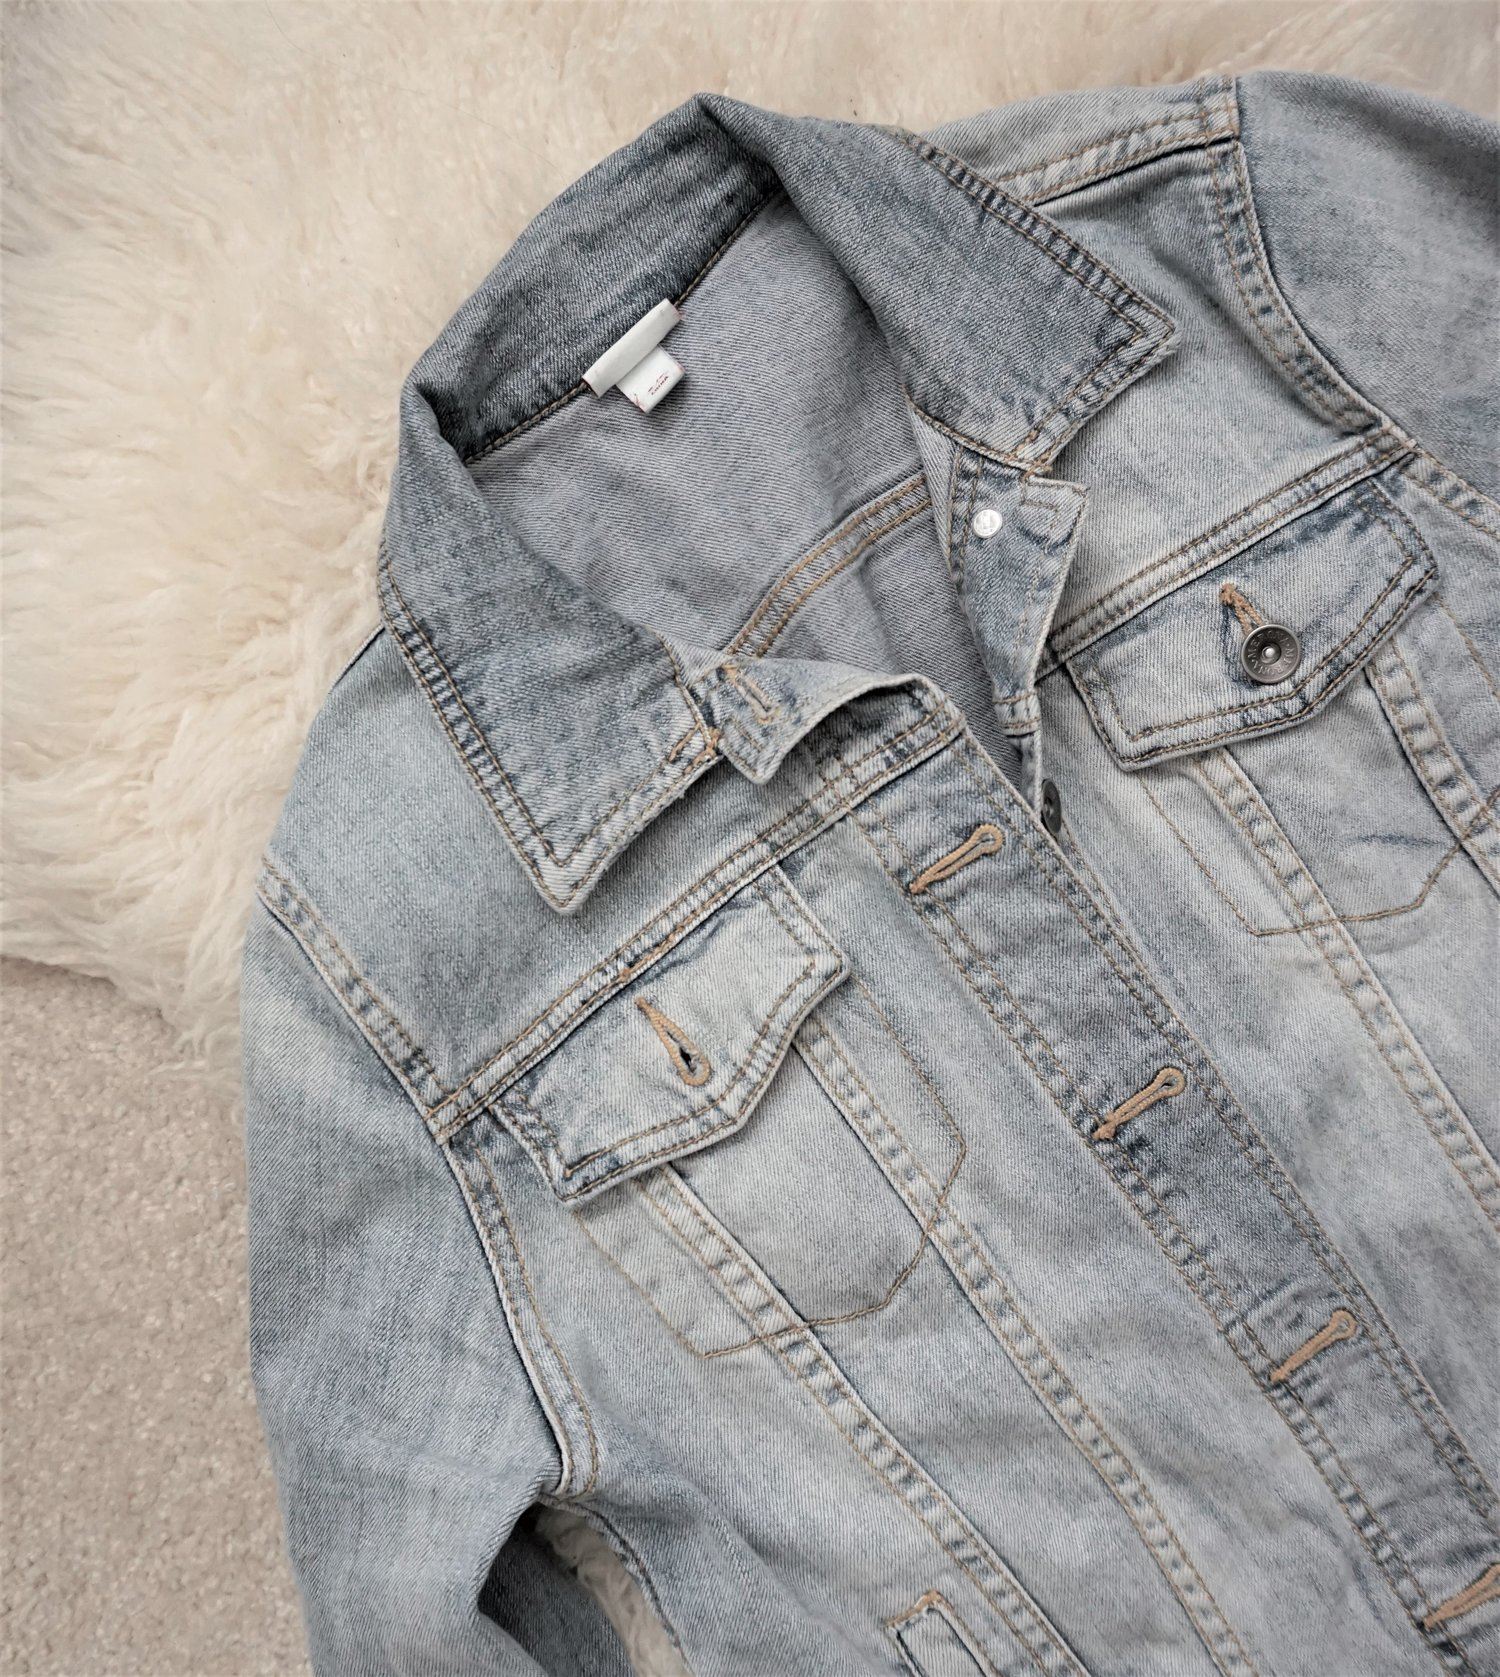 Denim Jacket, original thrifted price: $9.99, 50% off, total-$4.99